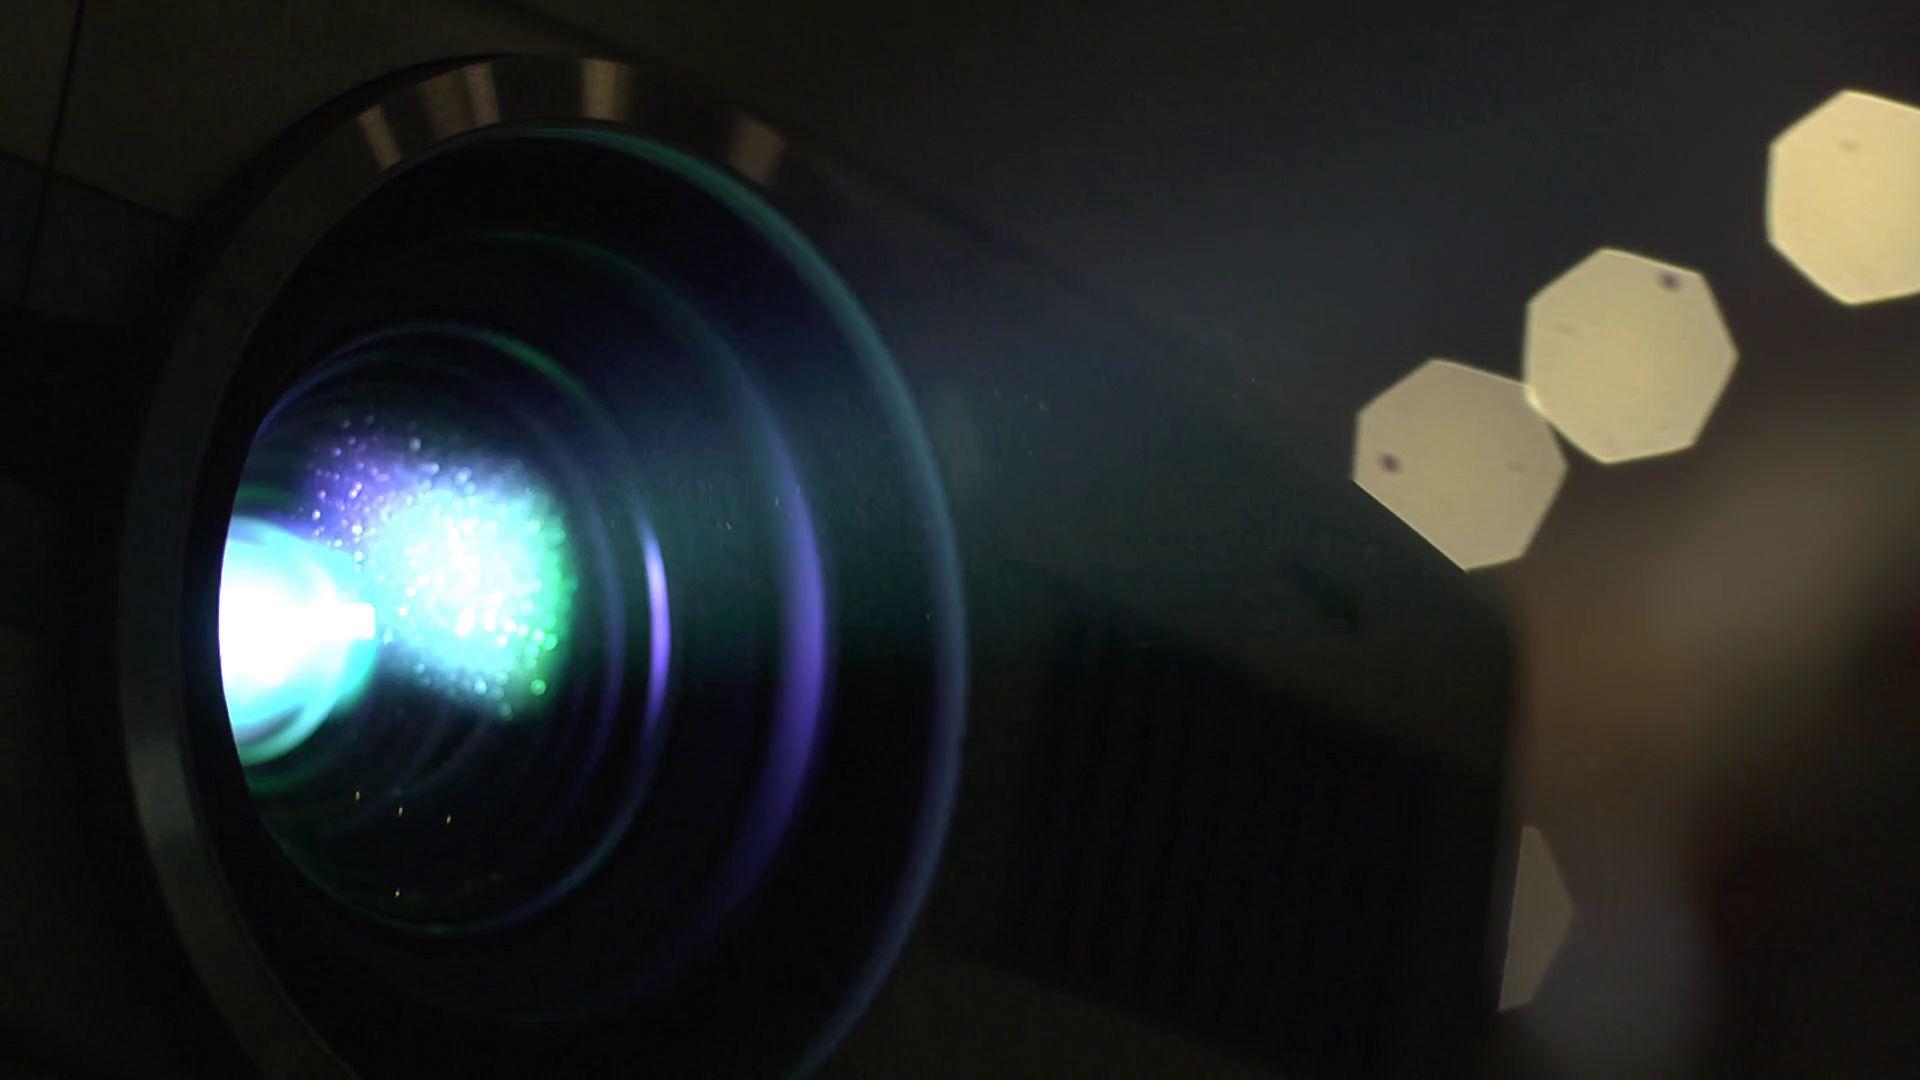 clean projector lens